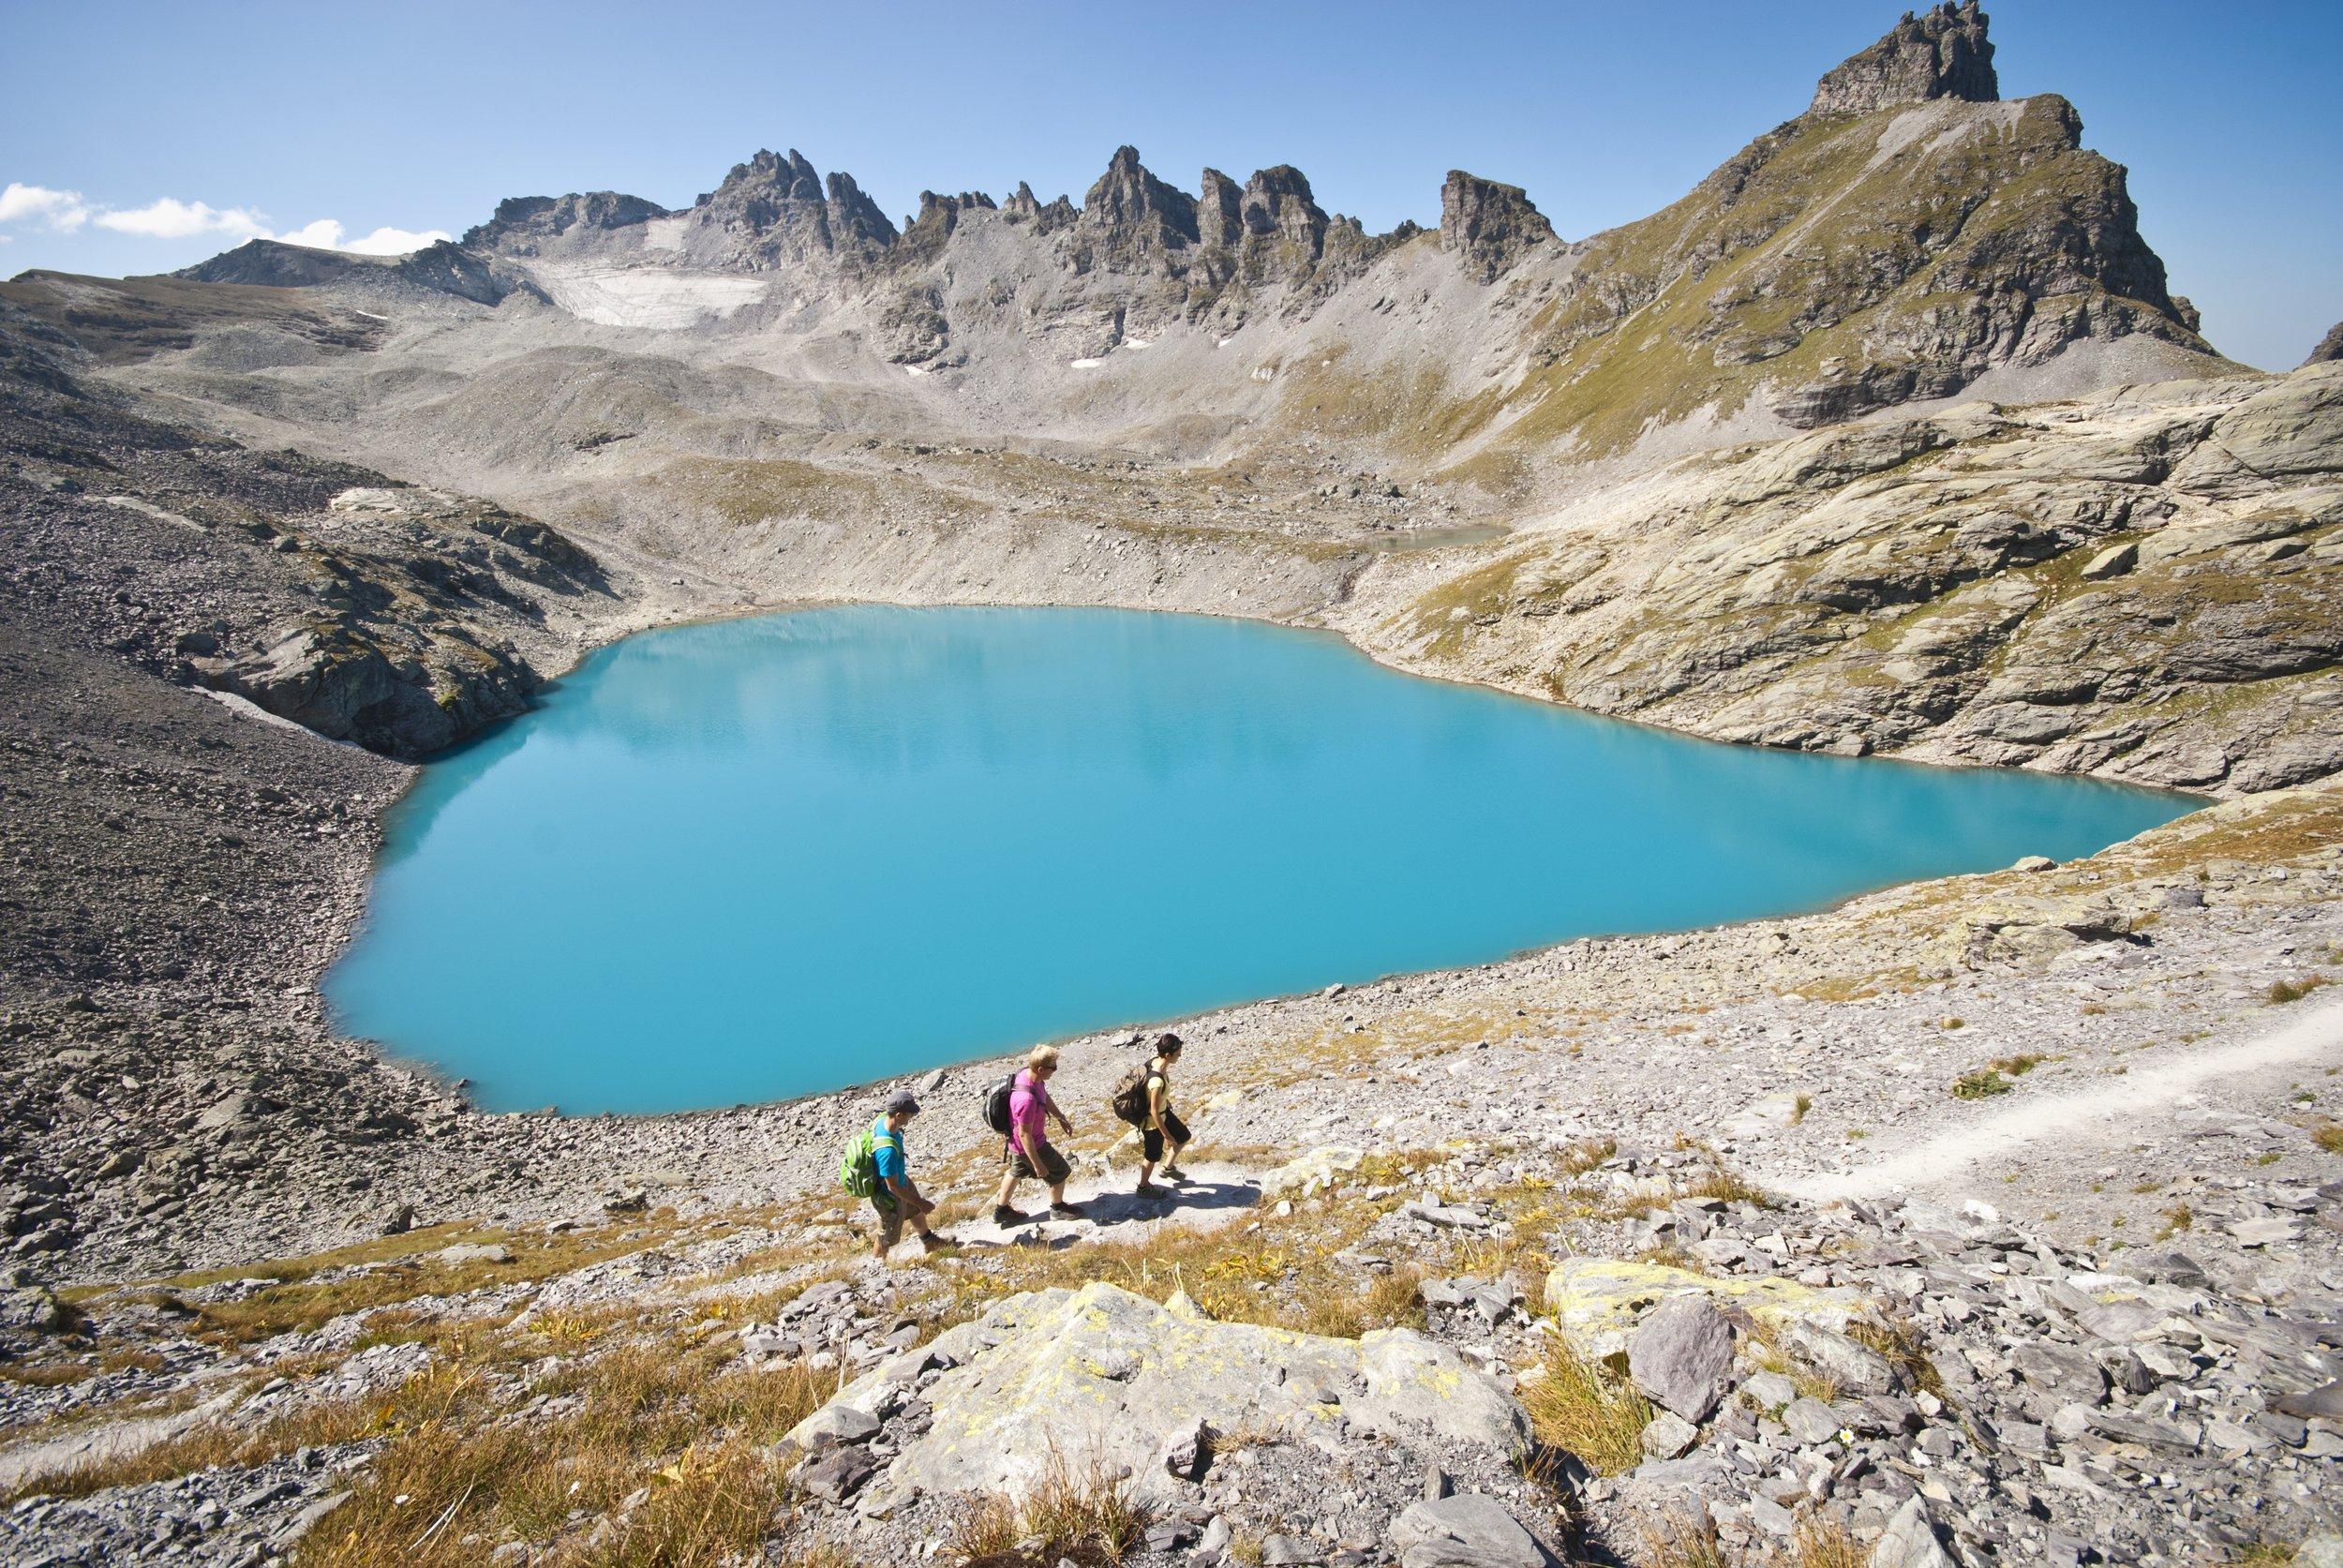 Fünf kristallklare Bergseen und einzigartige Einblicke ins UNESCO-Weltnaturerbe Teketonikarena Sardona prägen die 5-Seen-Wanderung.